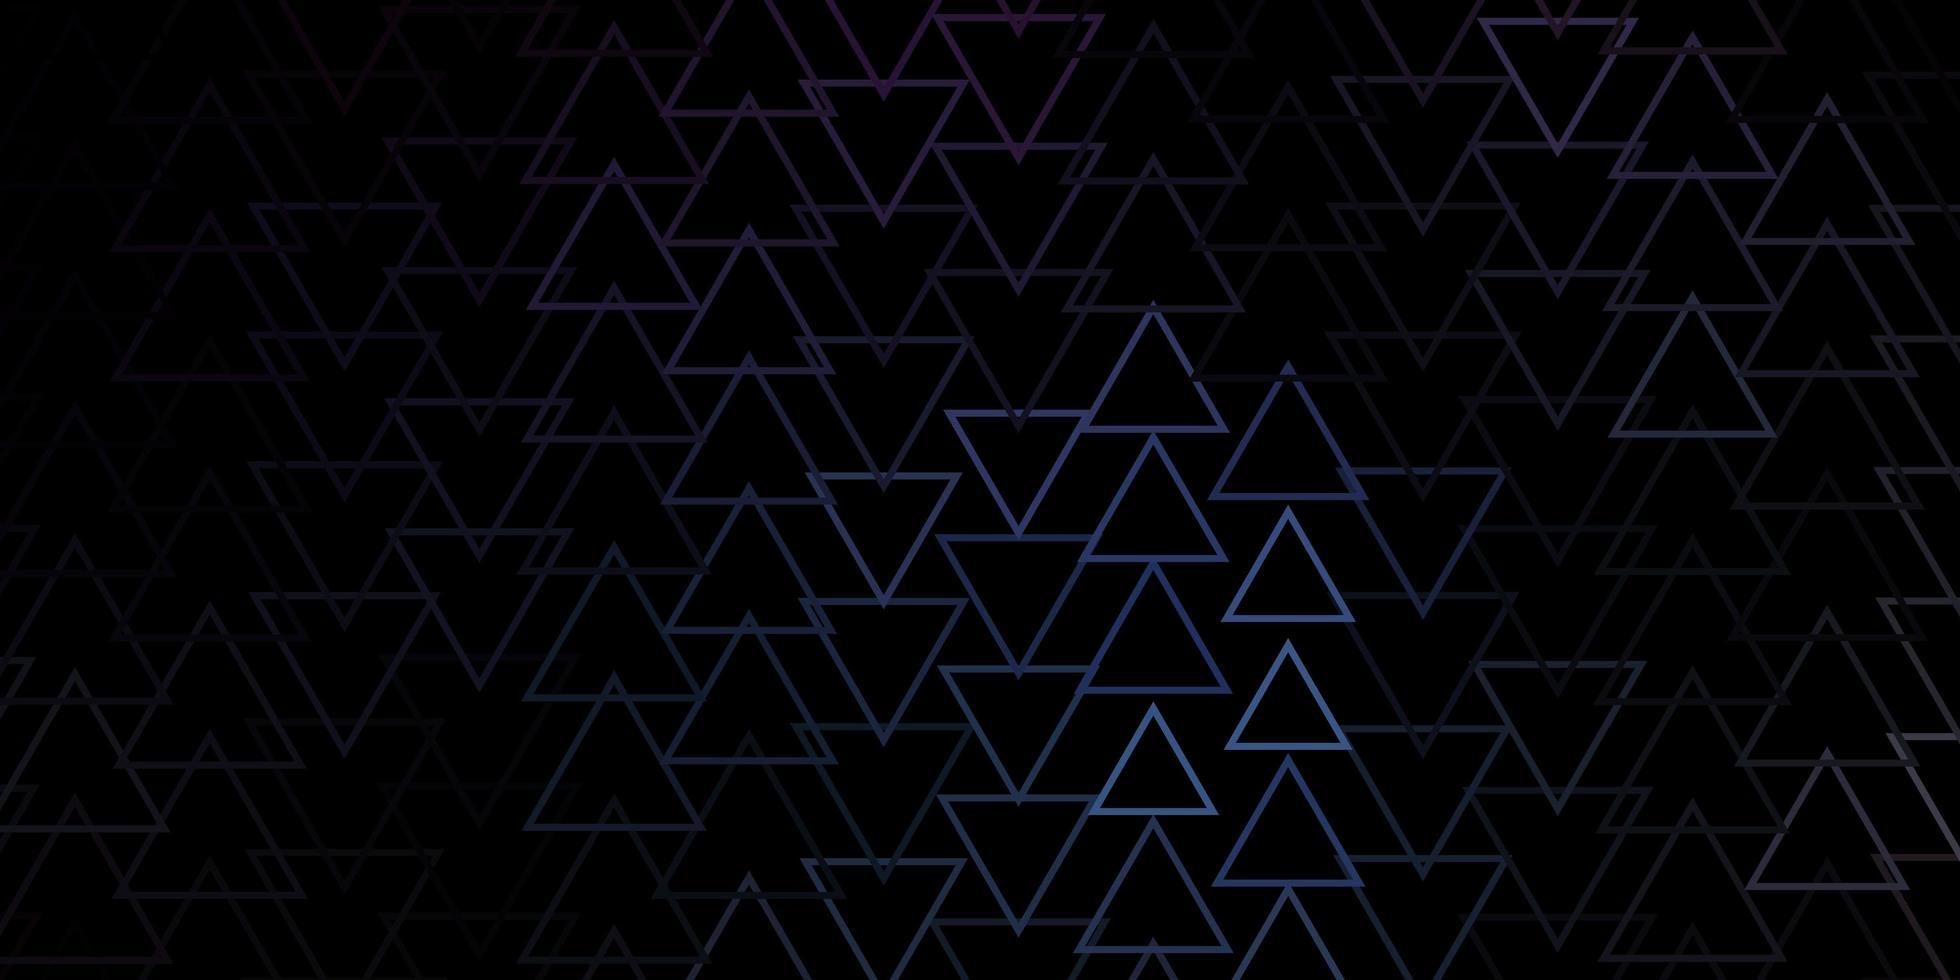 textura de vector azul oscuro con líneas, triángulos.